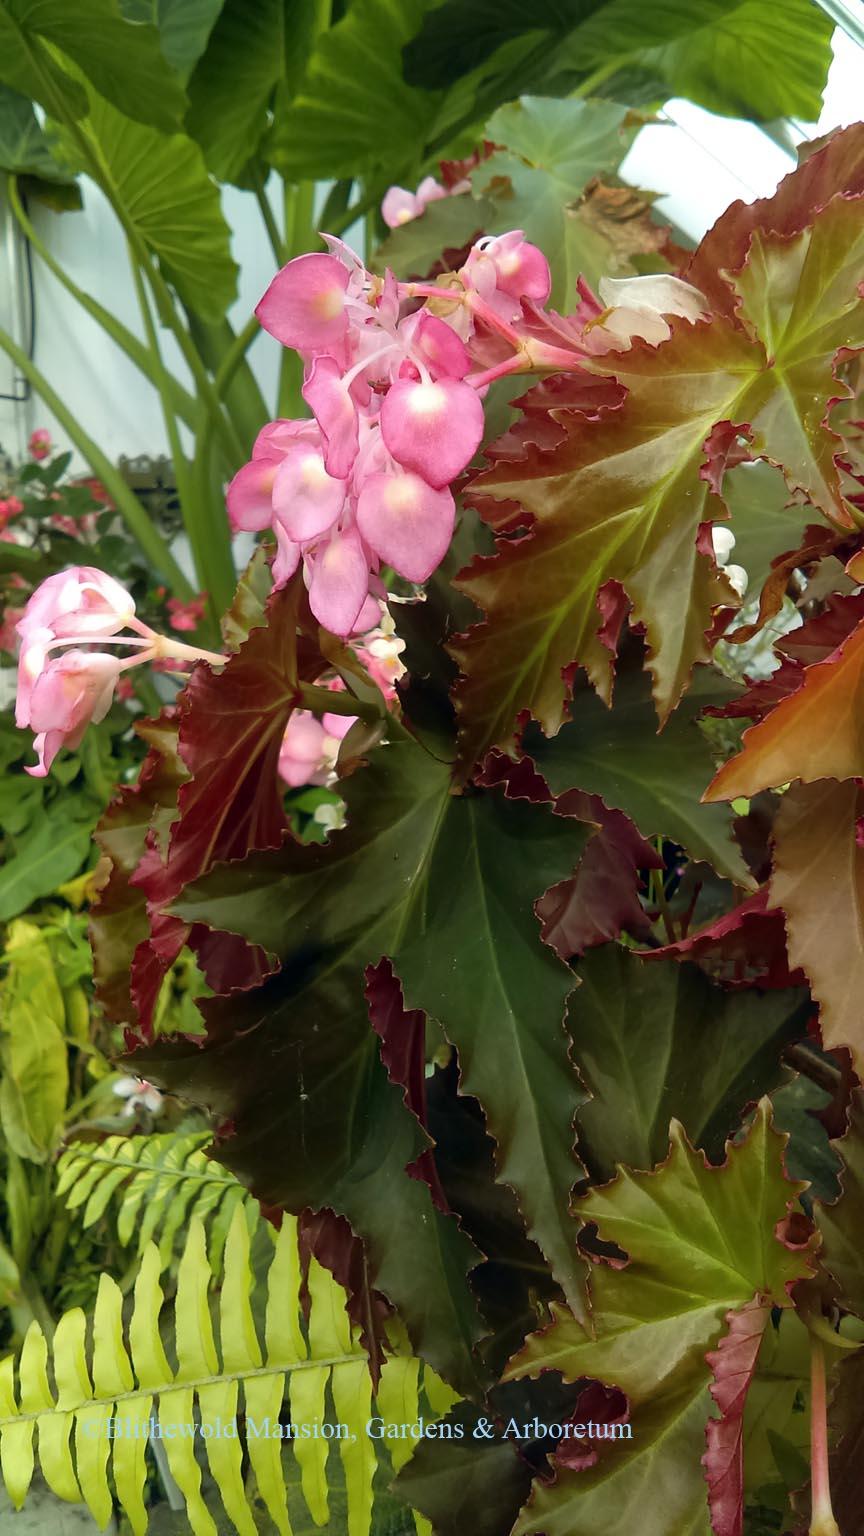 Begonia \'Anna Feile\' - Blithewold